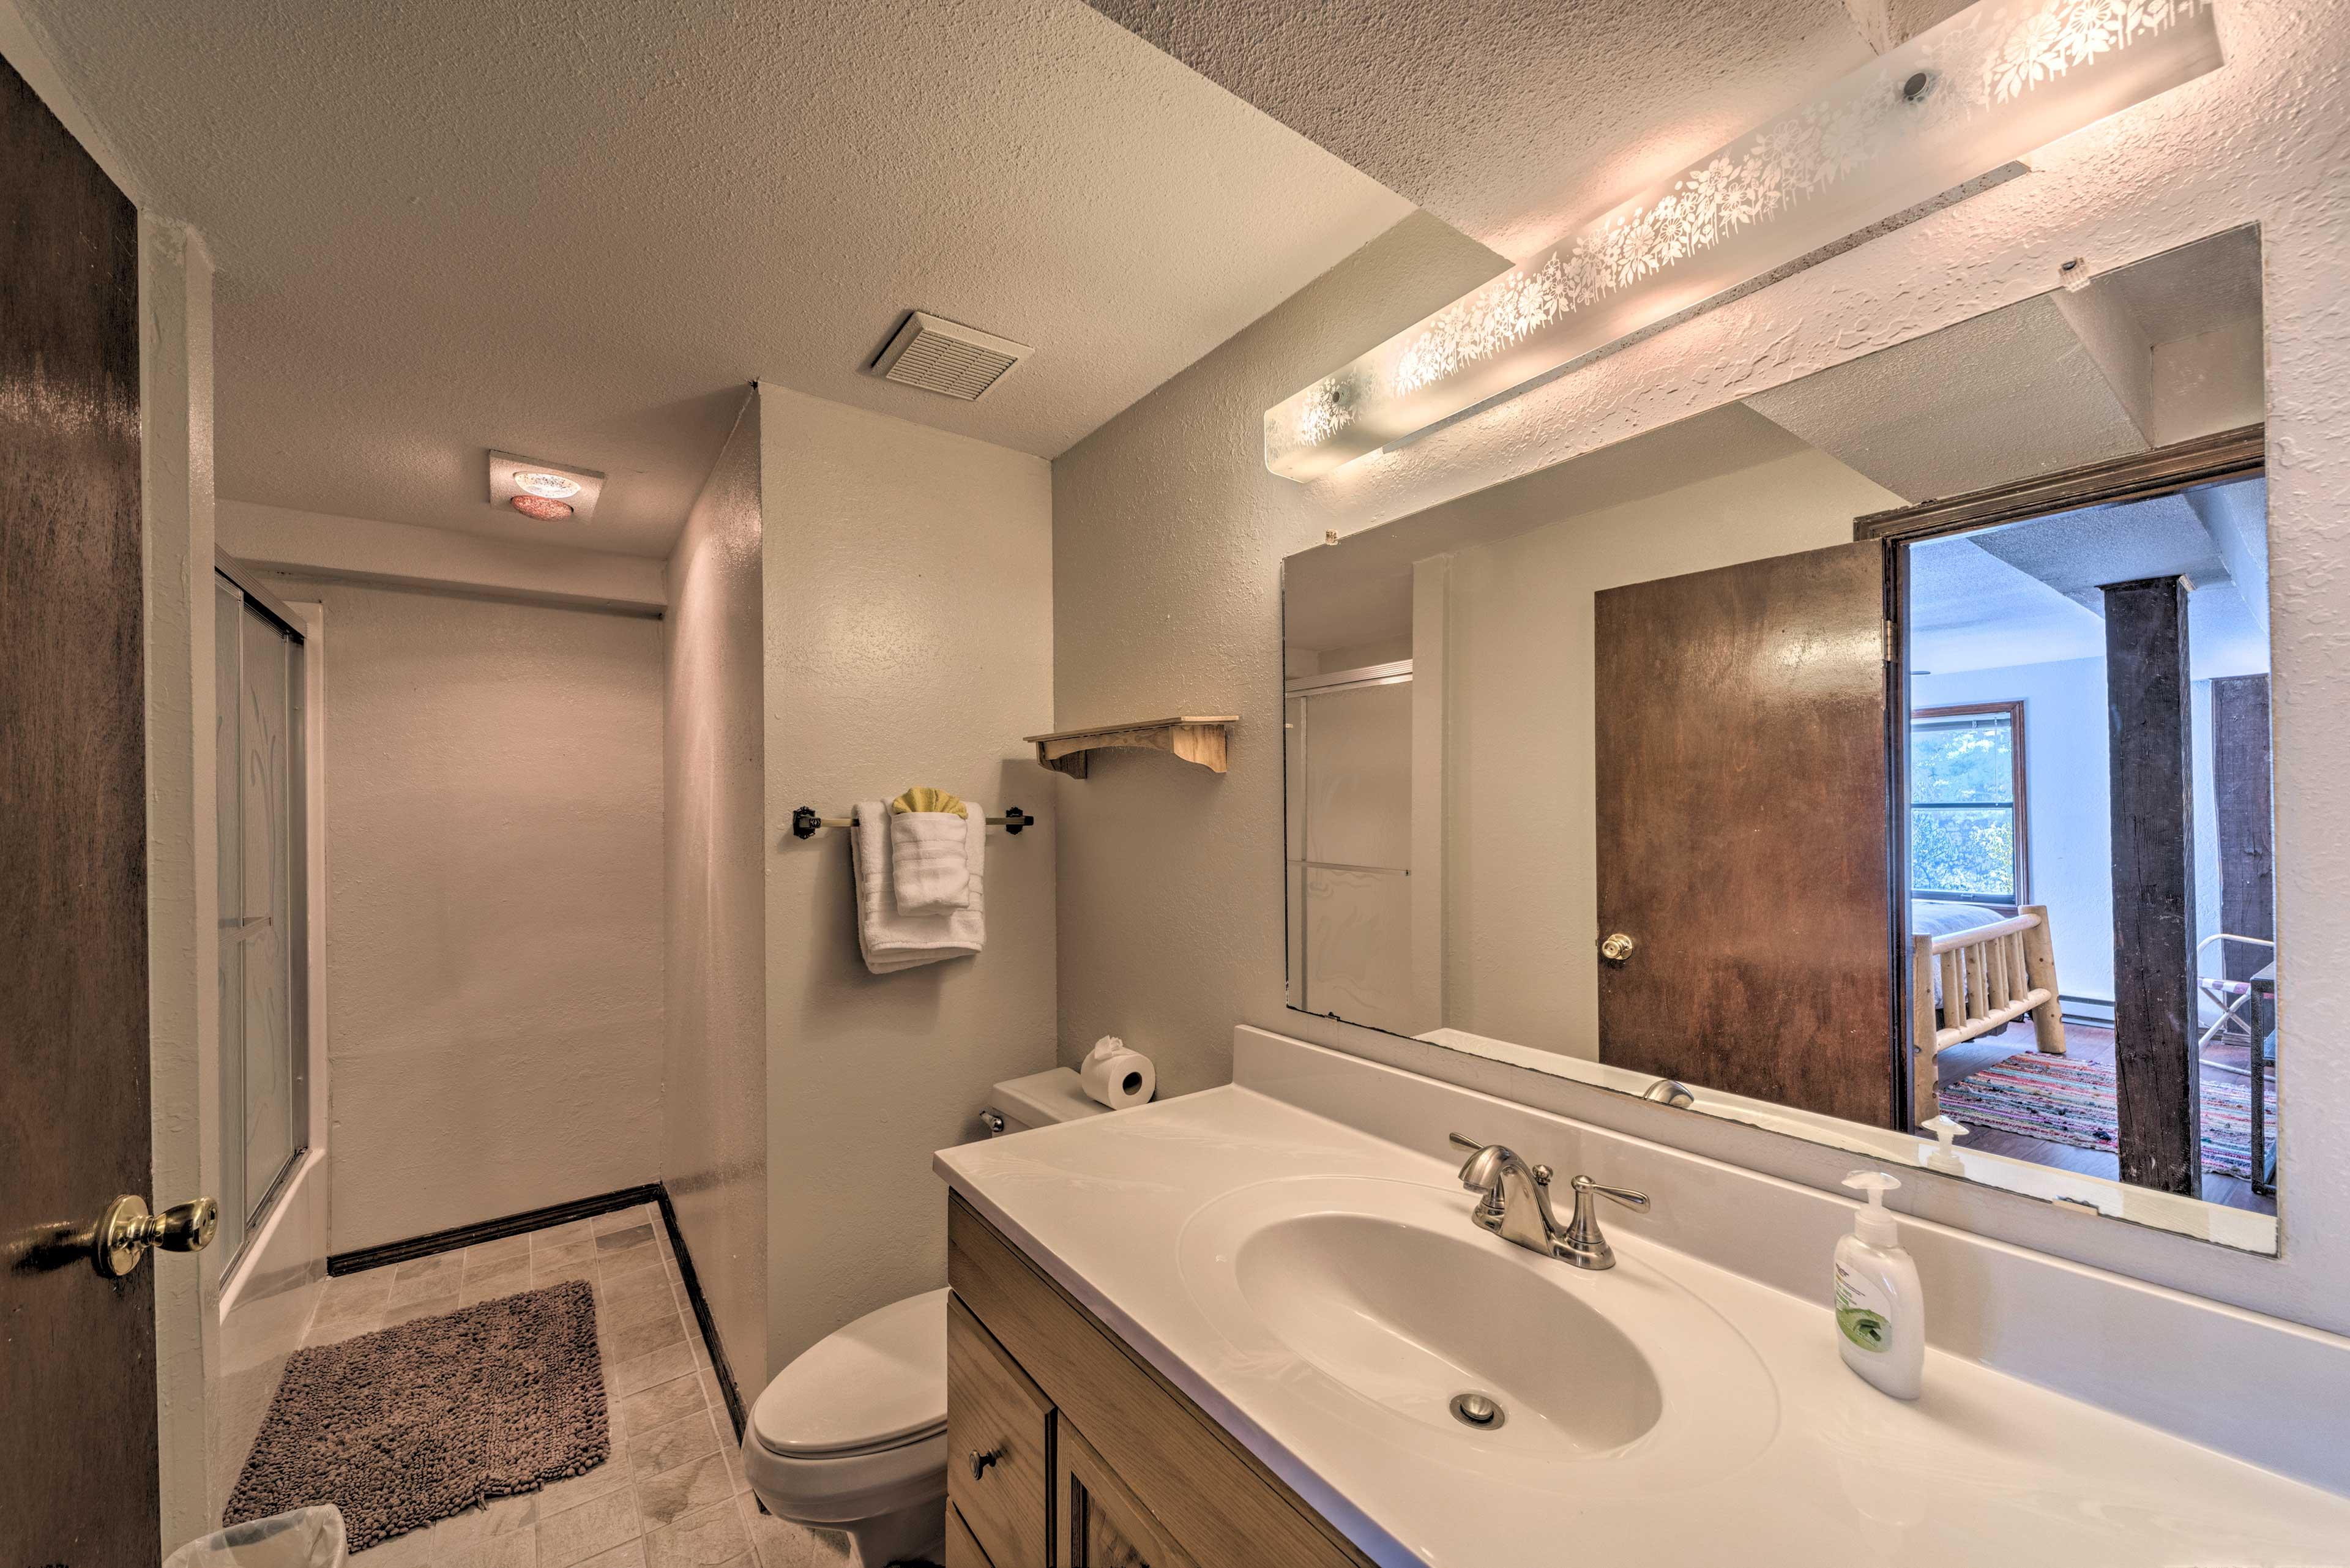 Full Bathroom 4 | Towels Provided